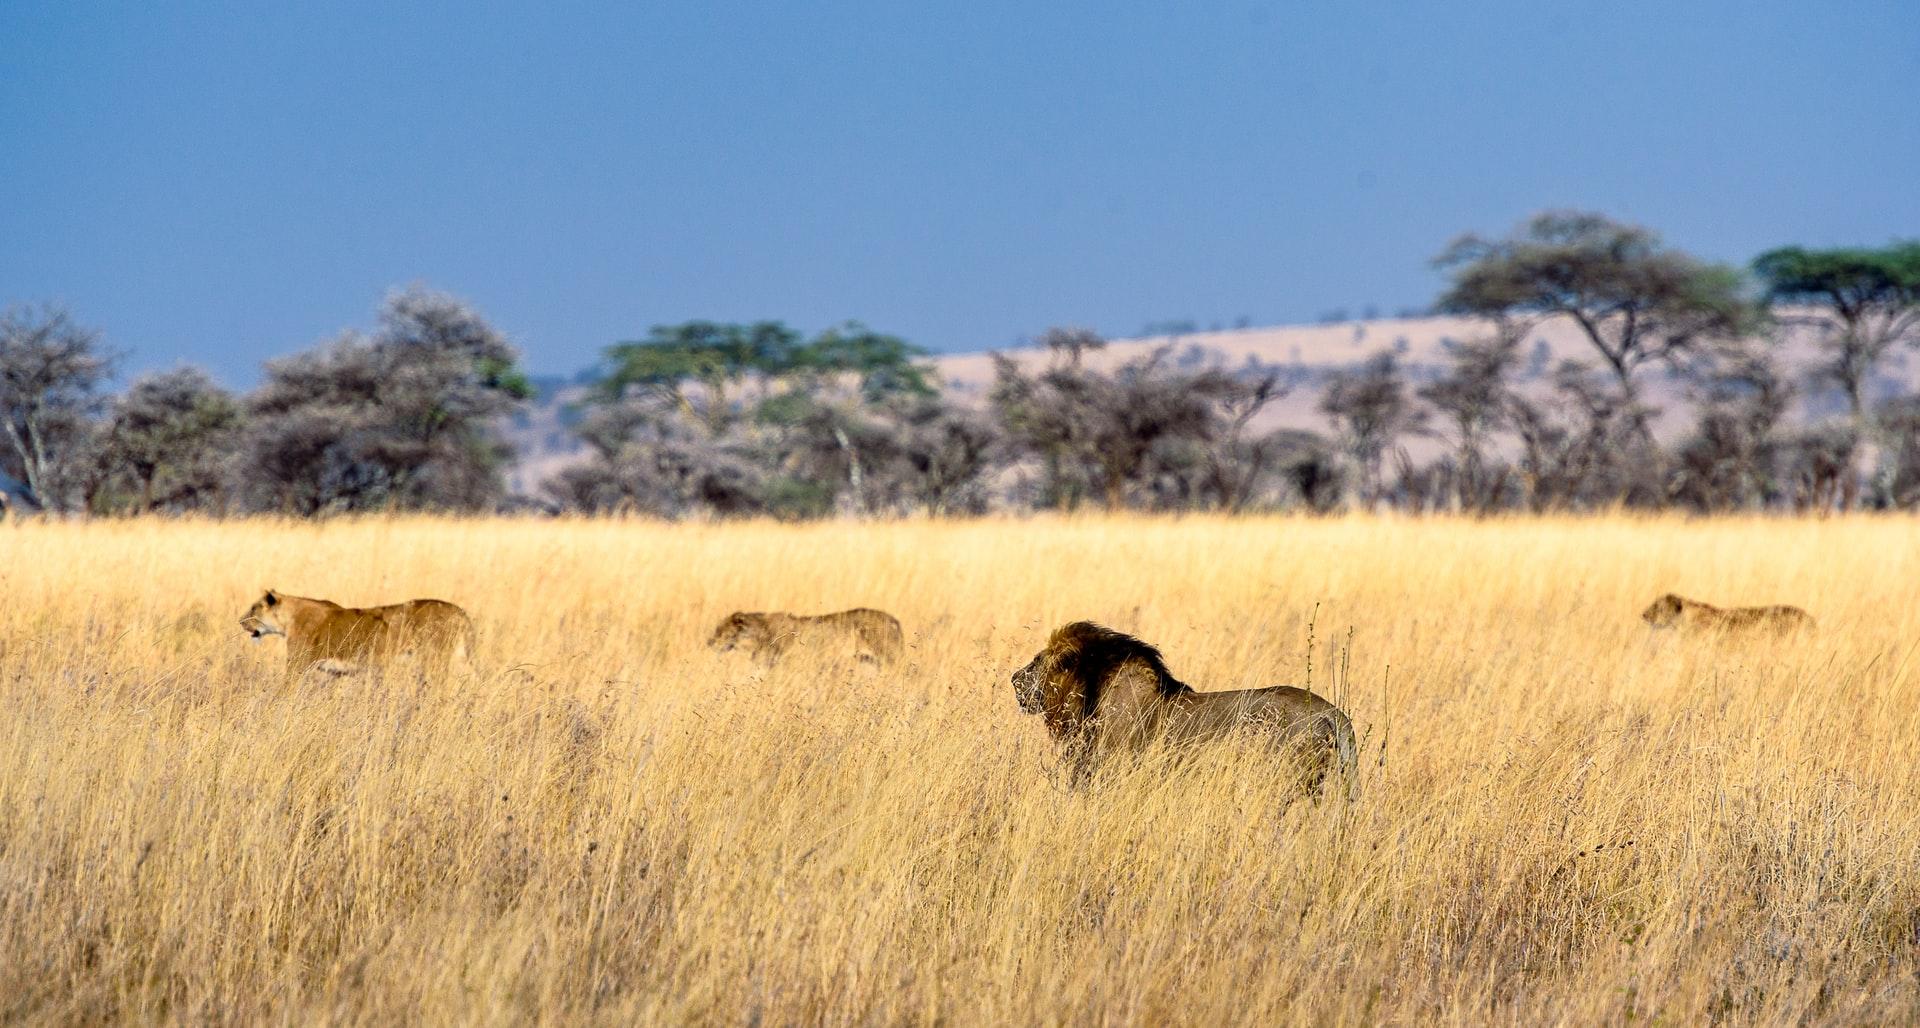 The Serengeti Tanzania